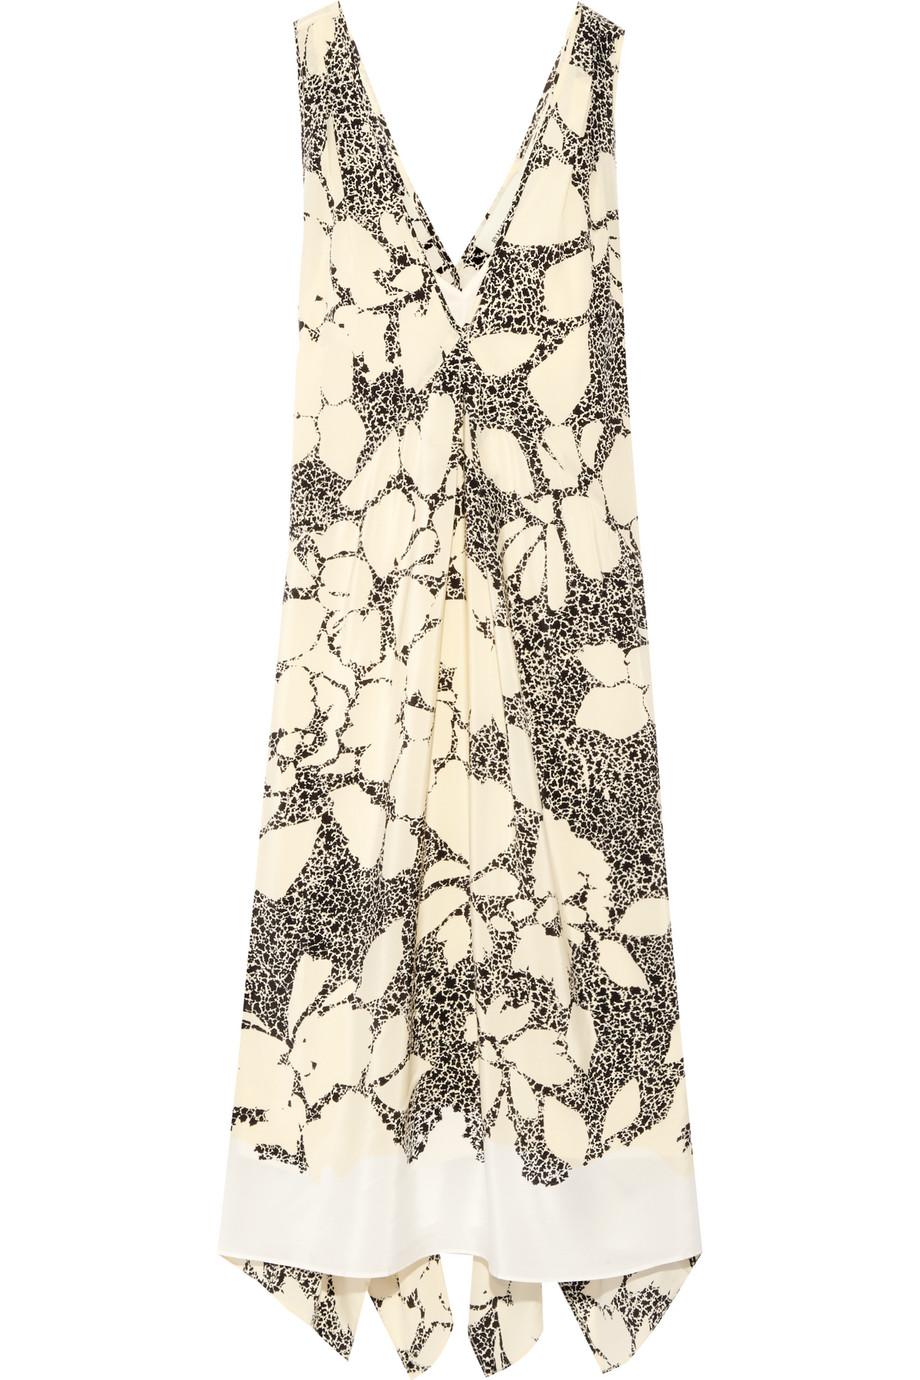 Quinesa Printed Silk-Crepe Dress, By Malene Birger, Cream, Women's - Printed, Size: 32